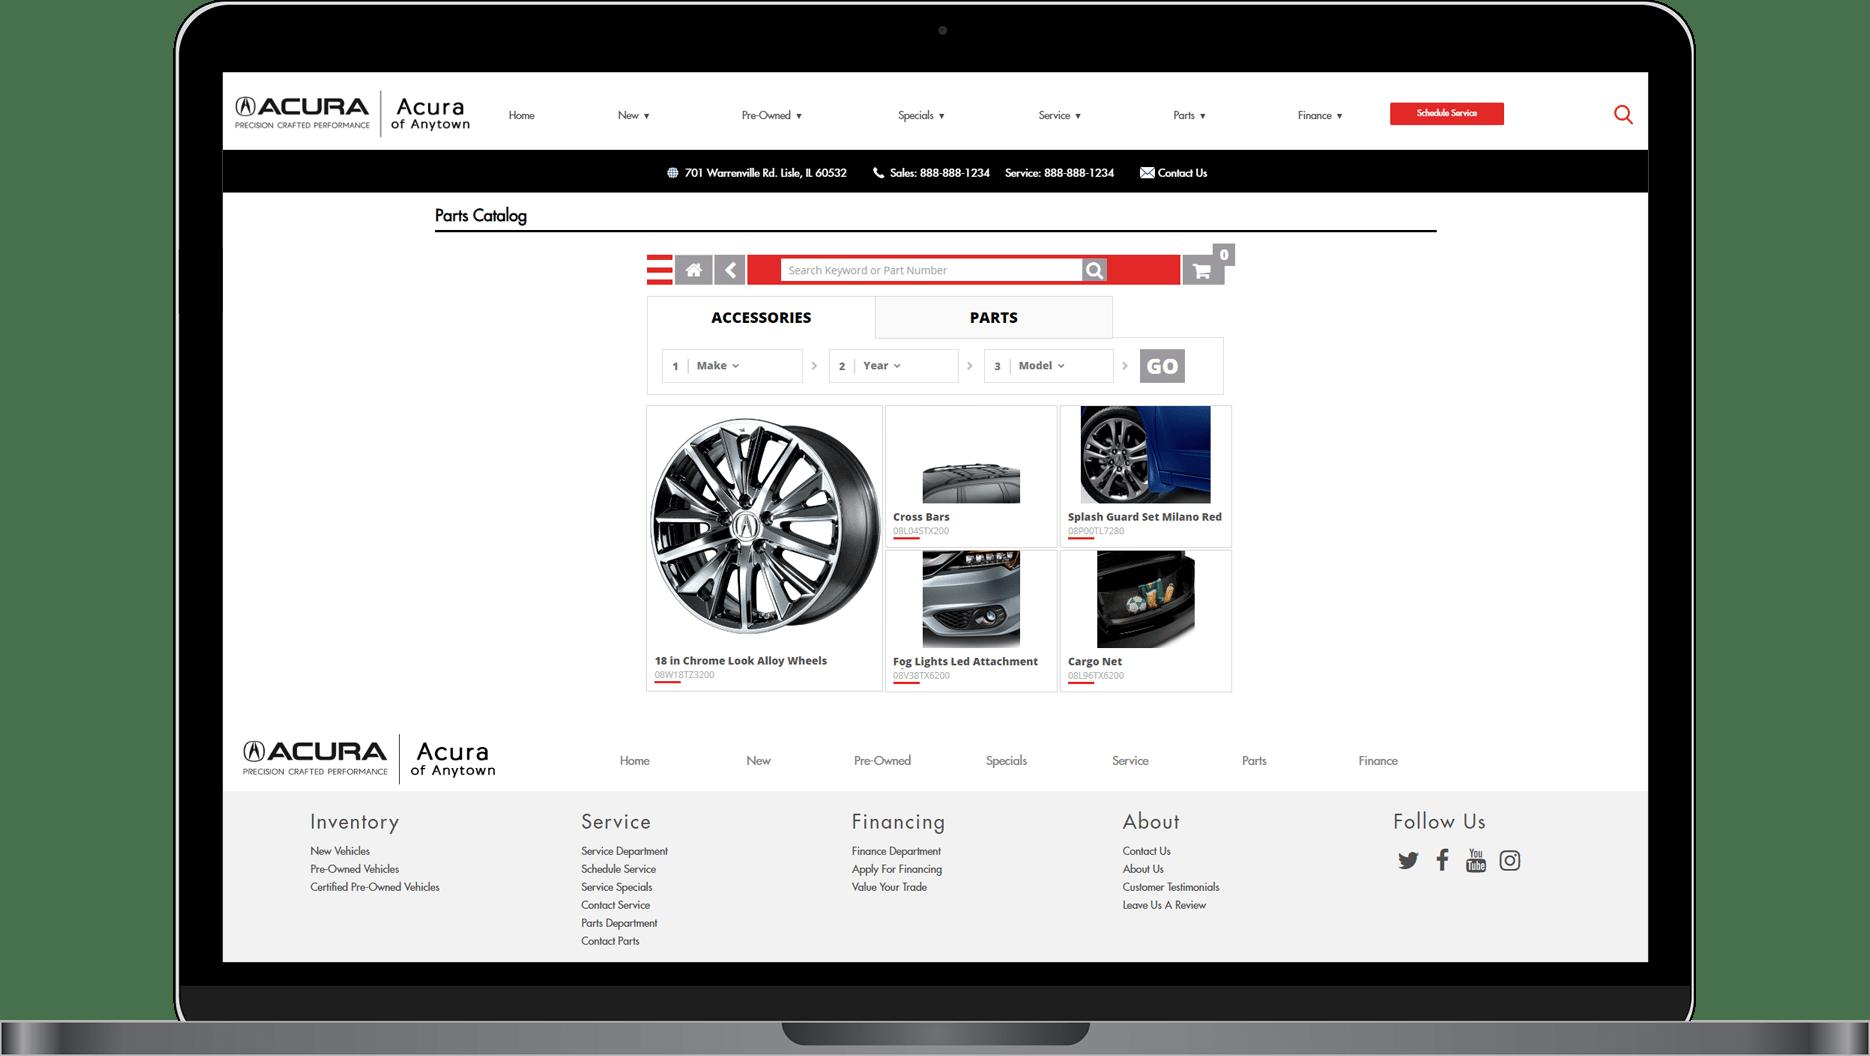 Parts Catalog on Acura website